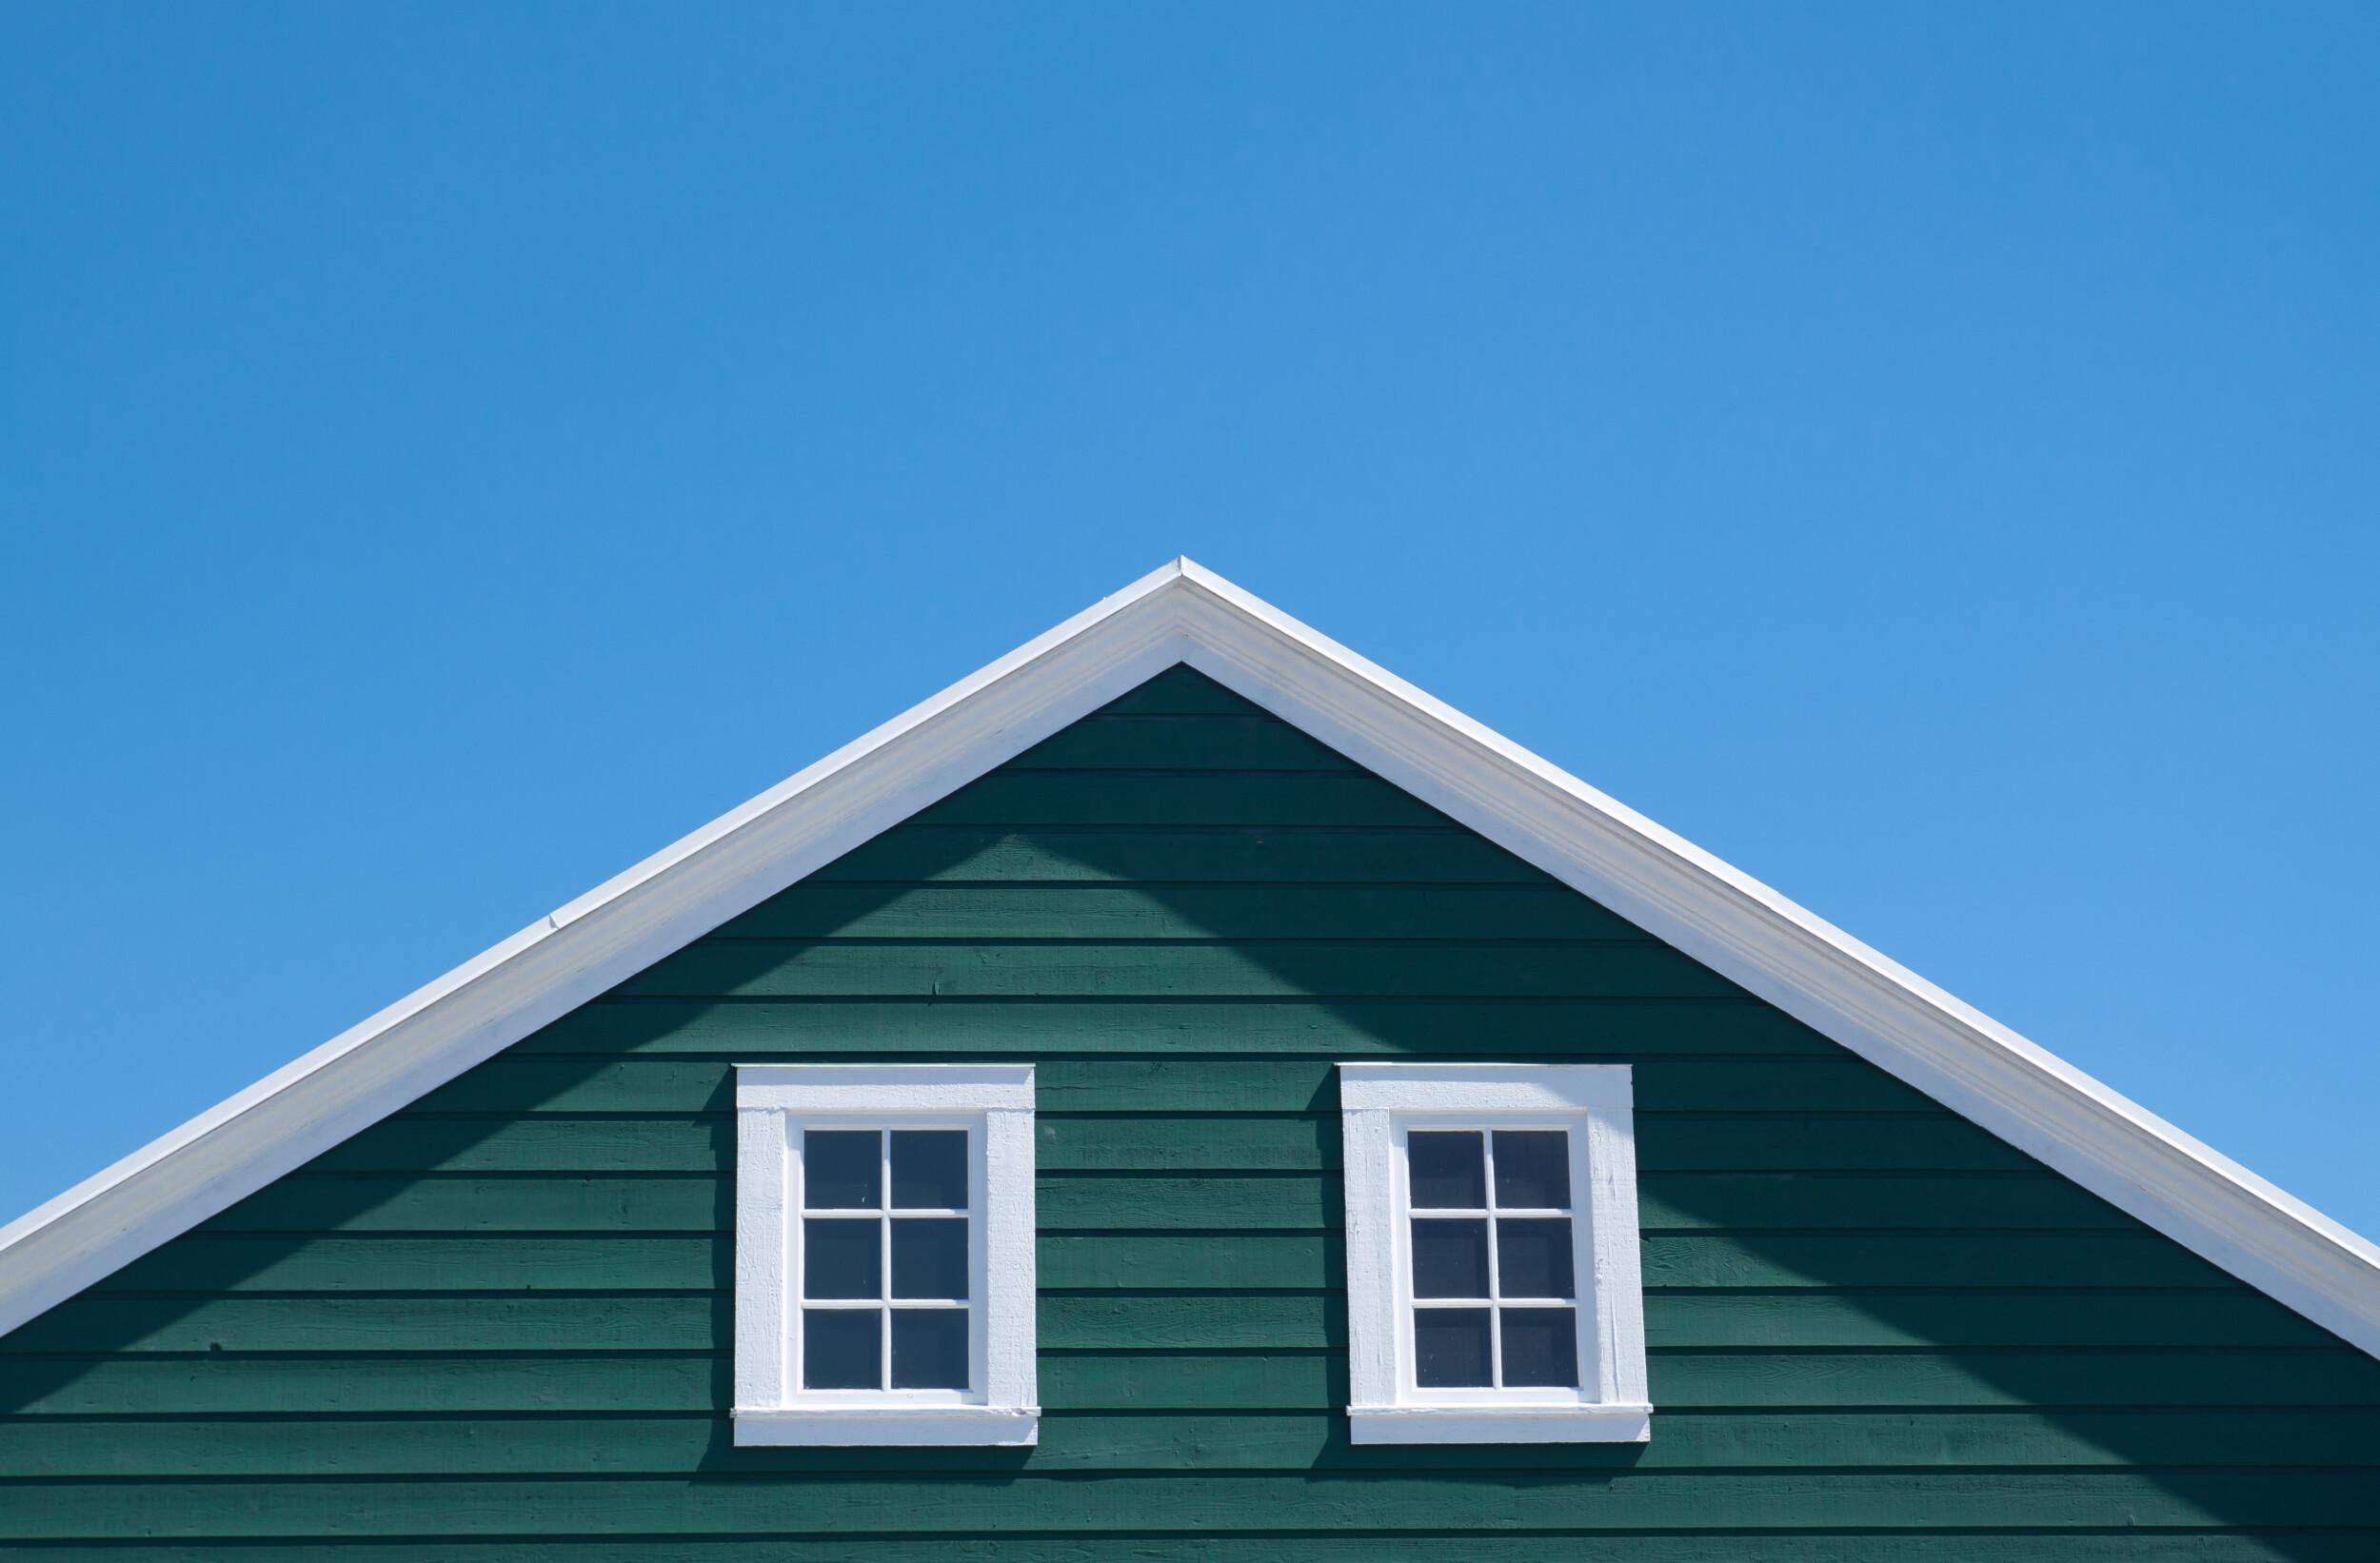 deep green house exterior